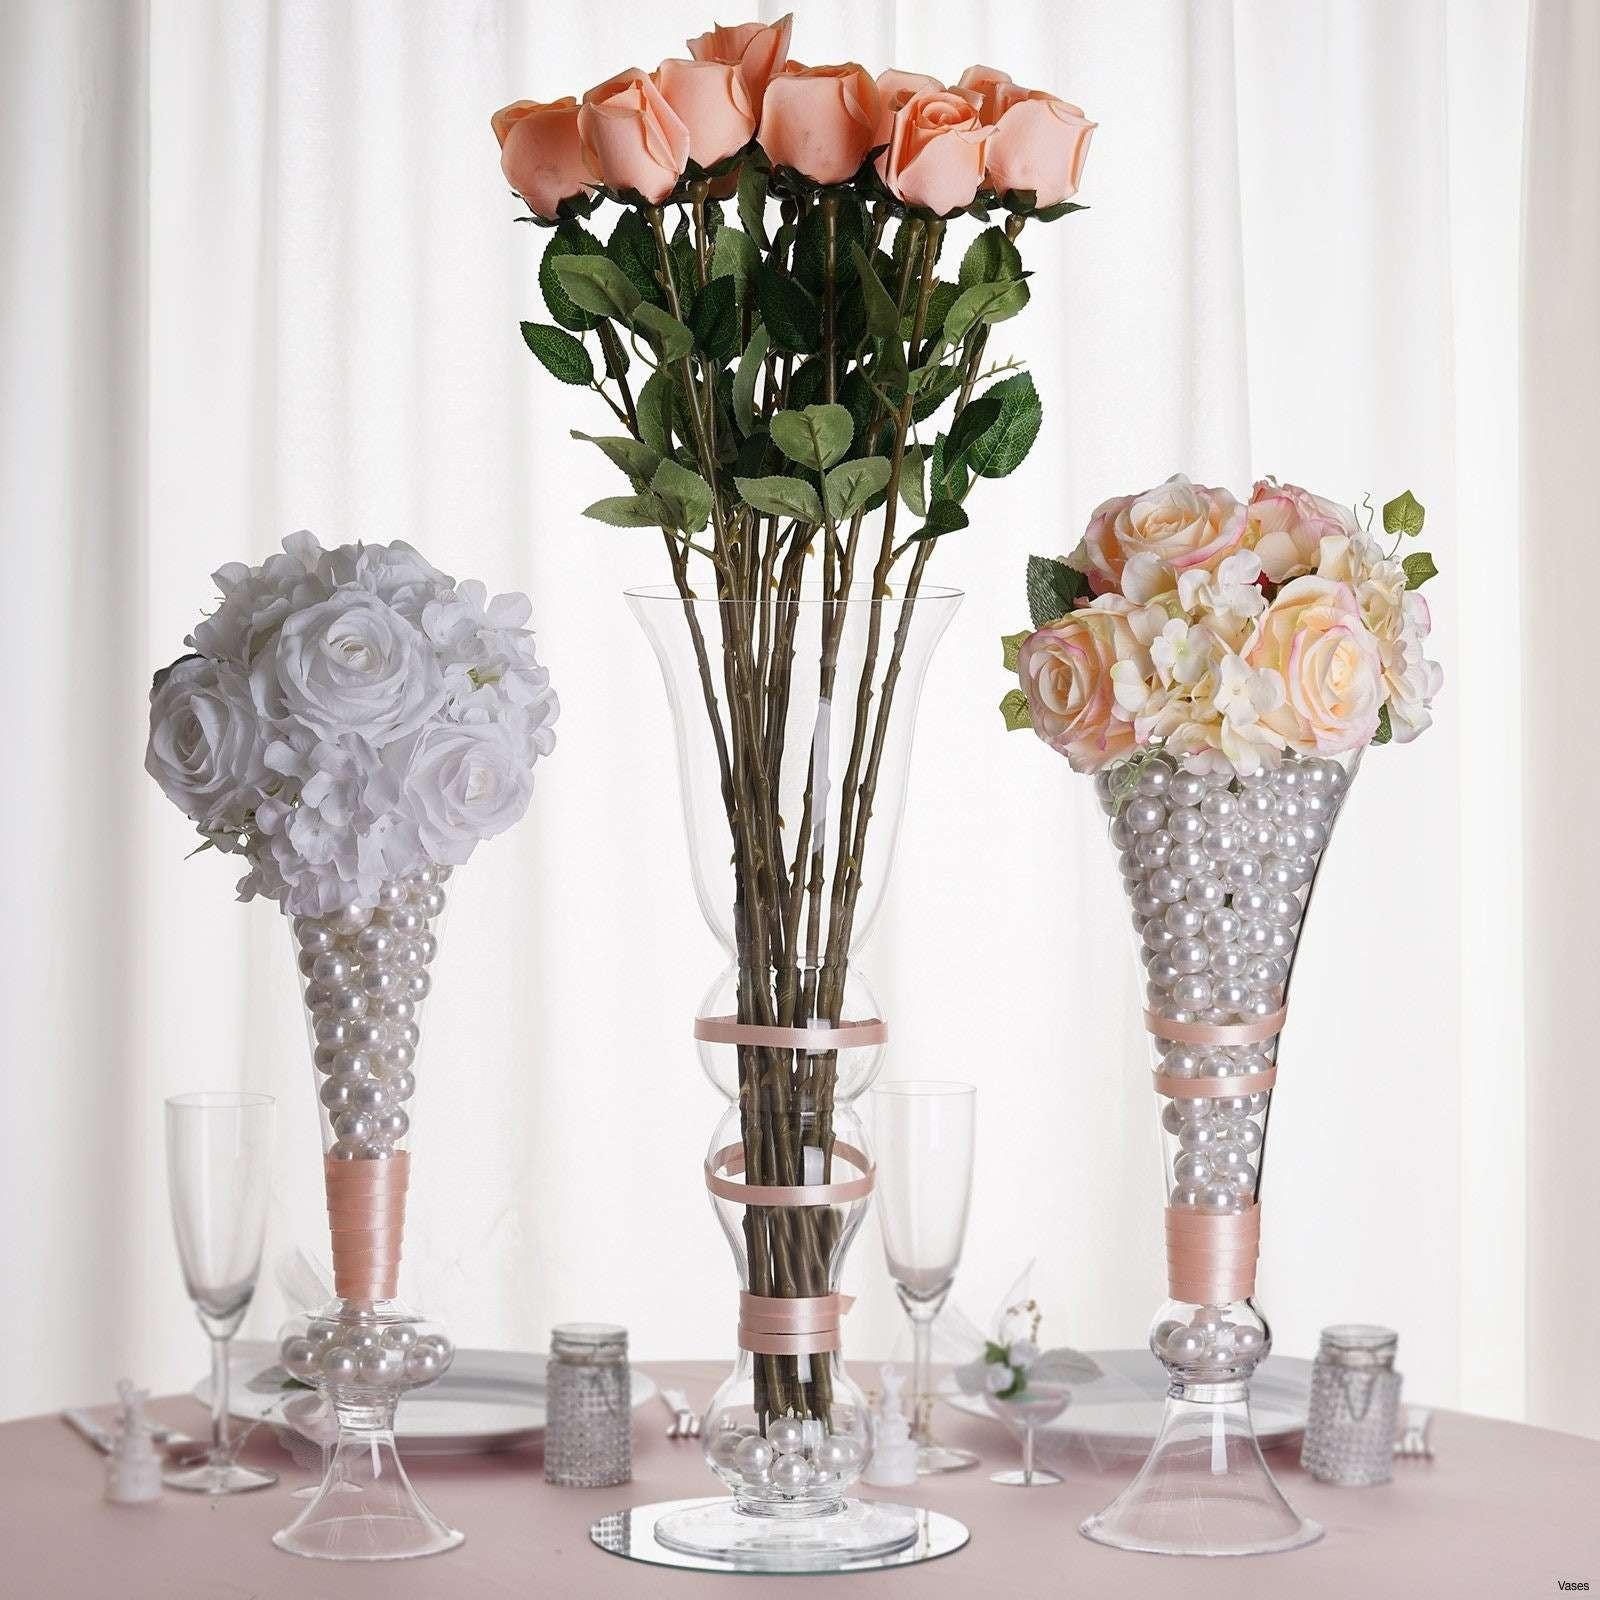 vase decoration ideas of 27 elegant flower vase ideas for decorating flower decoration ideas for flower vase ideas for decorating best of flower vase table 04h vases tablei 0d clipart dining